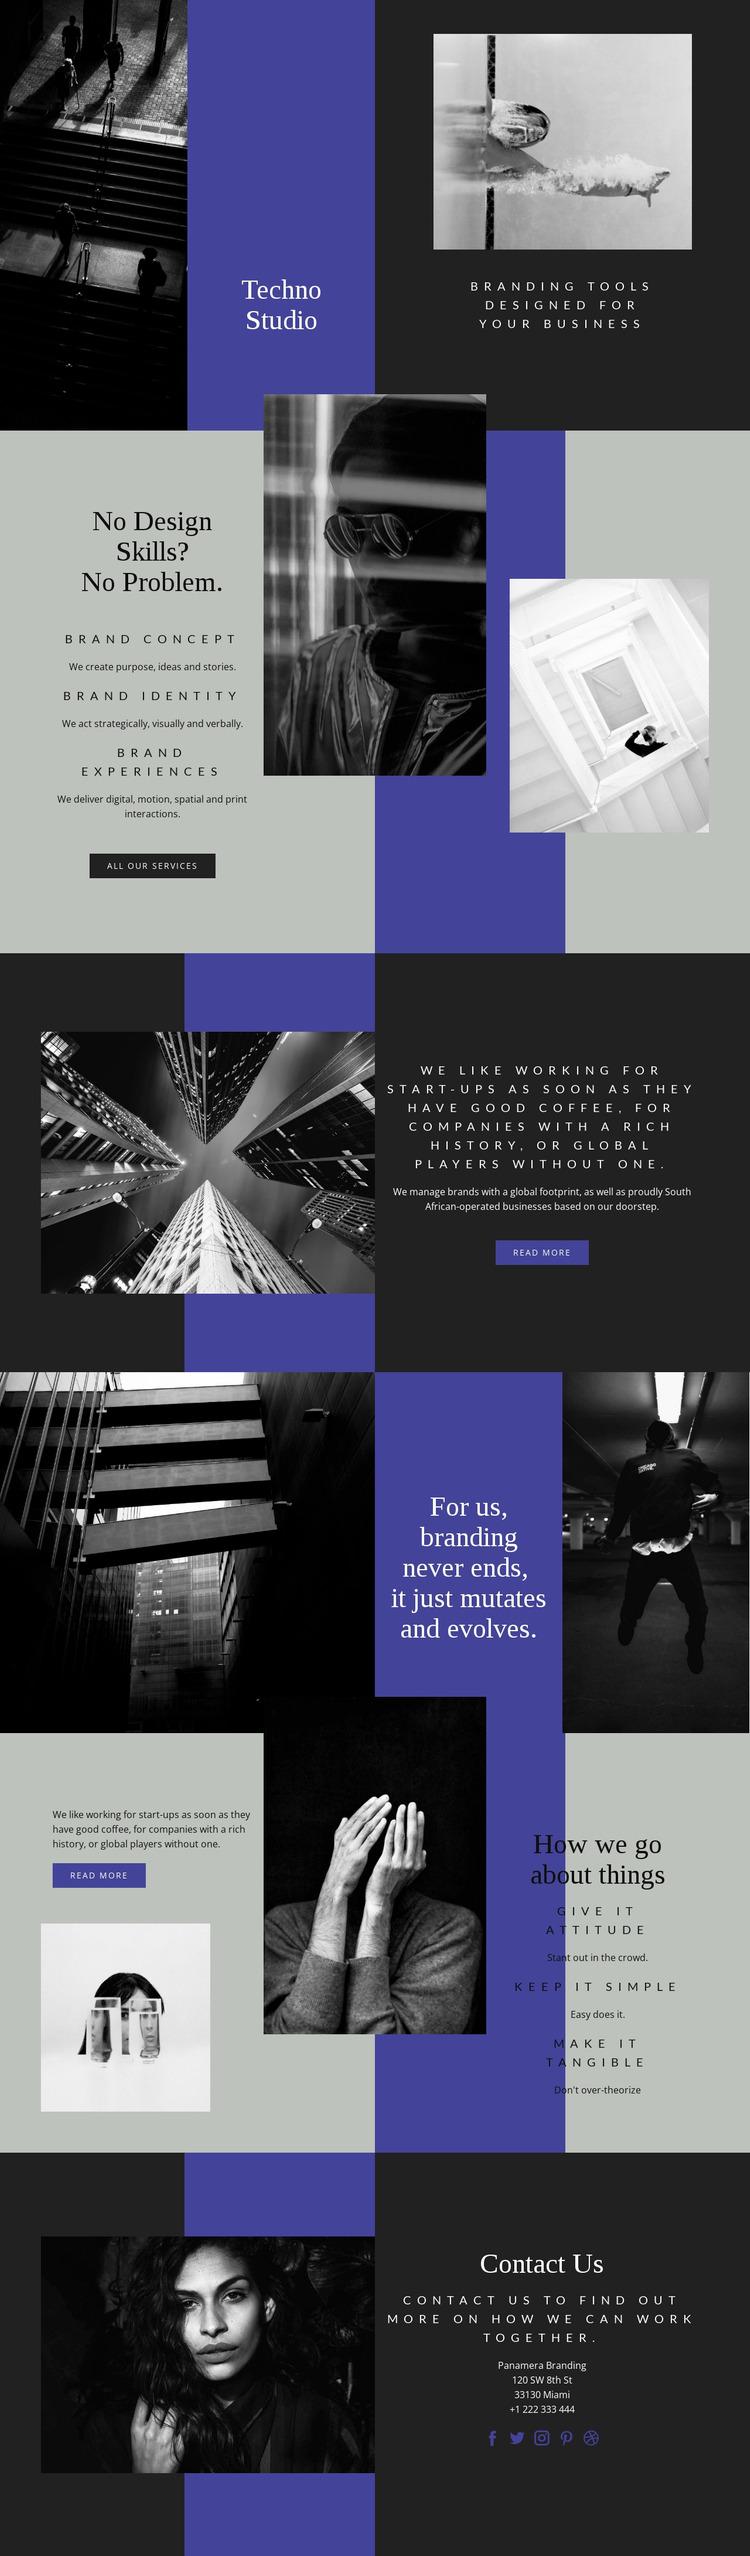 Techno skills in business Website Mockup